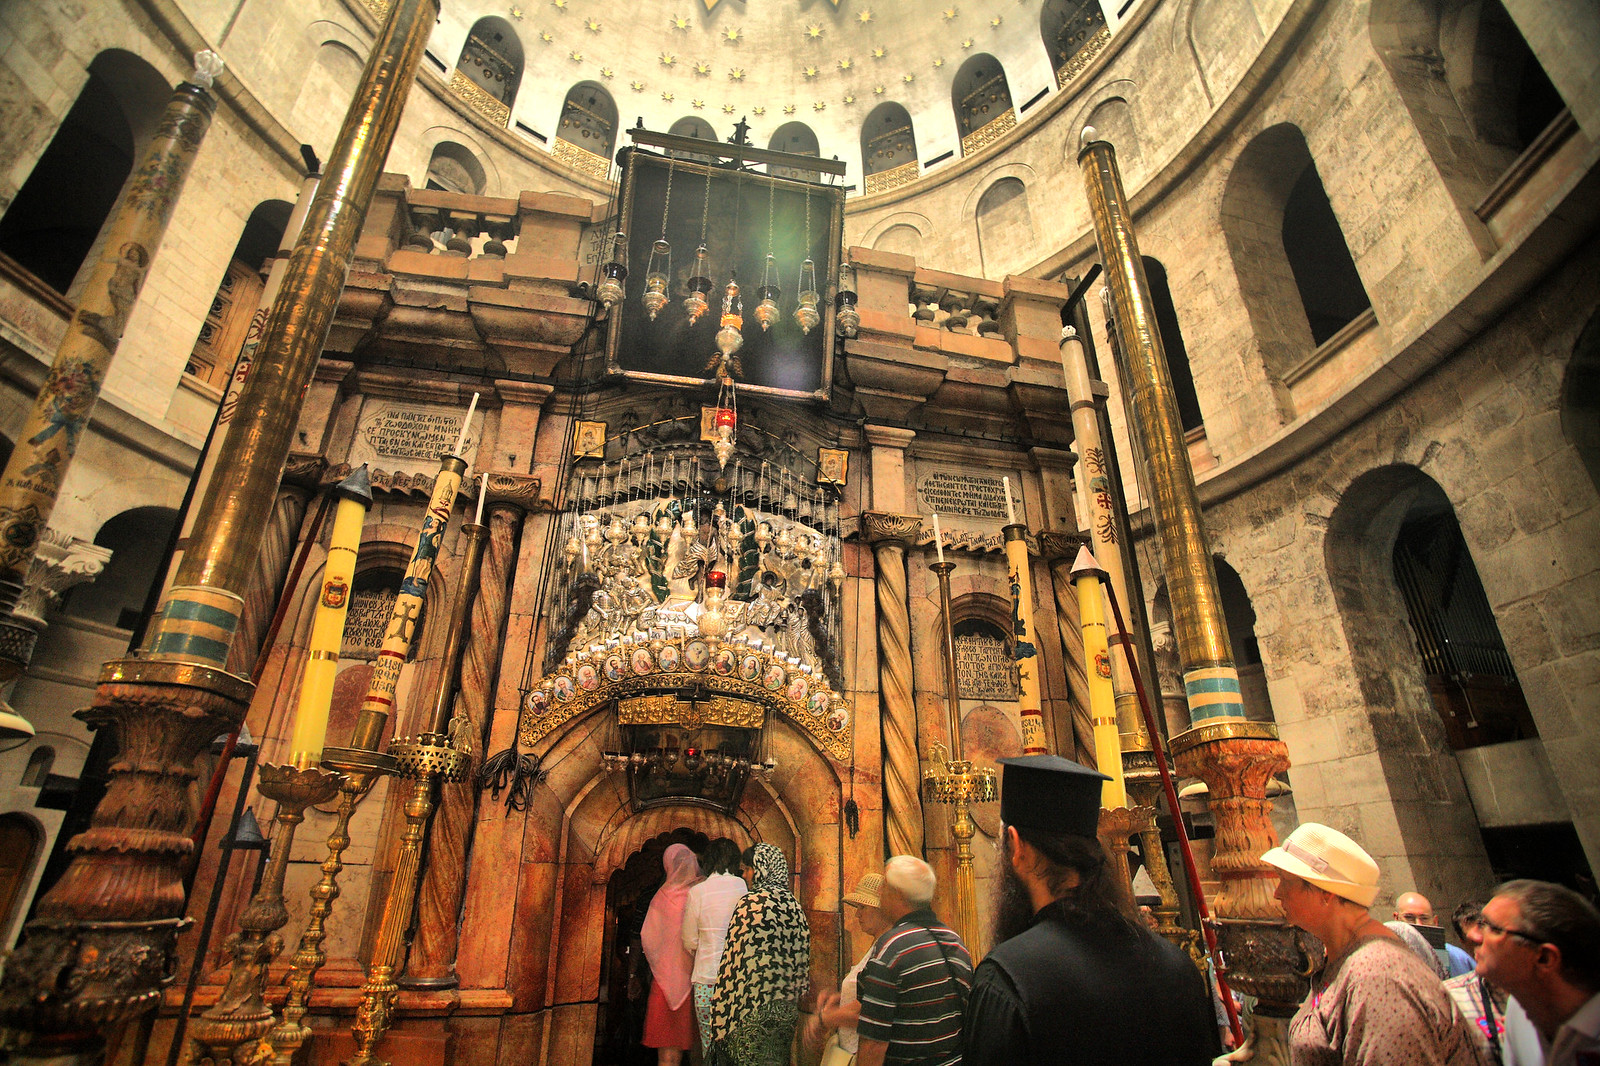 Jerusalem_Holy Sepulcher_The Edicule_1_Noam Chen_IMOT